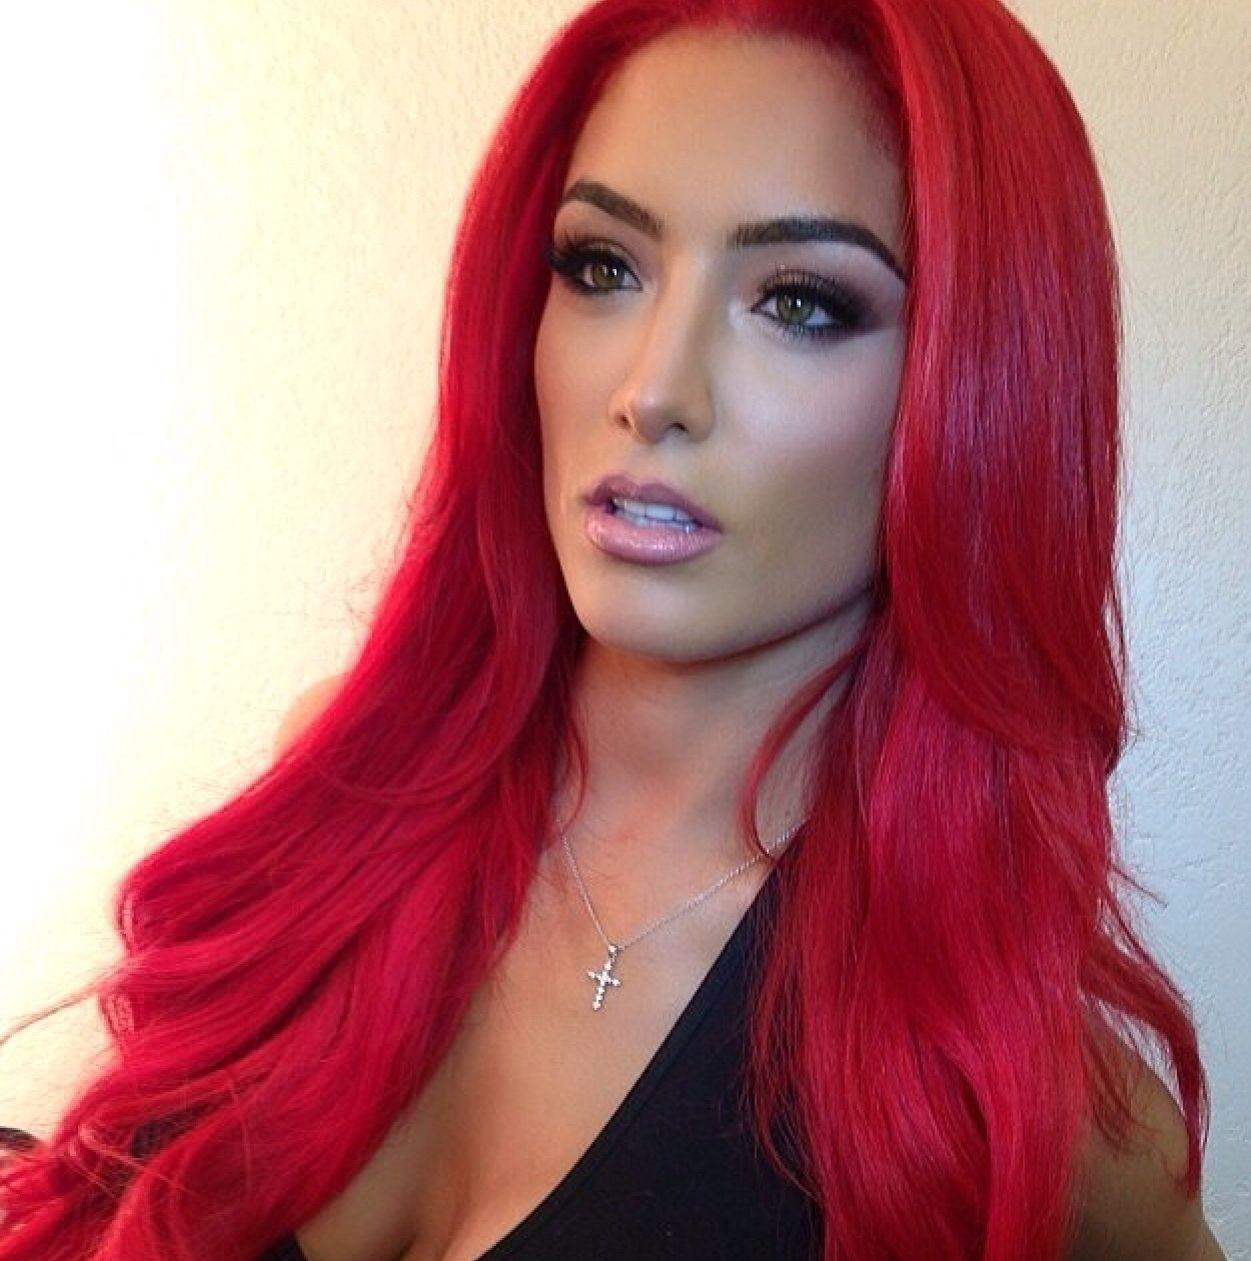 red hair love wwe diva eva